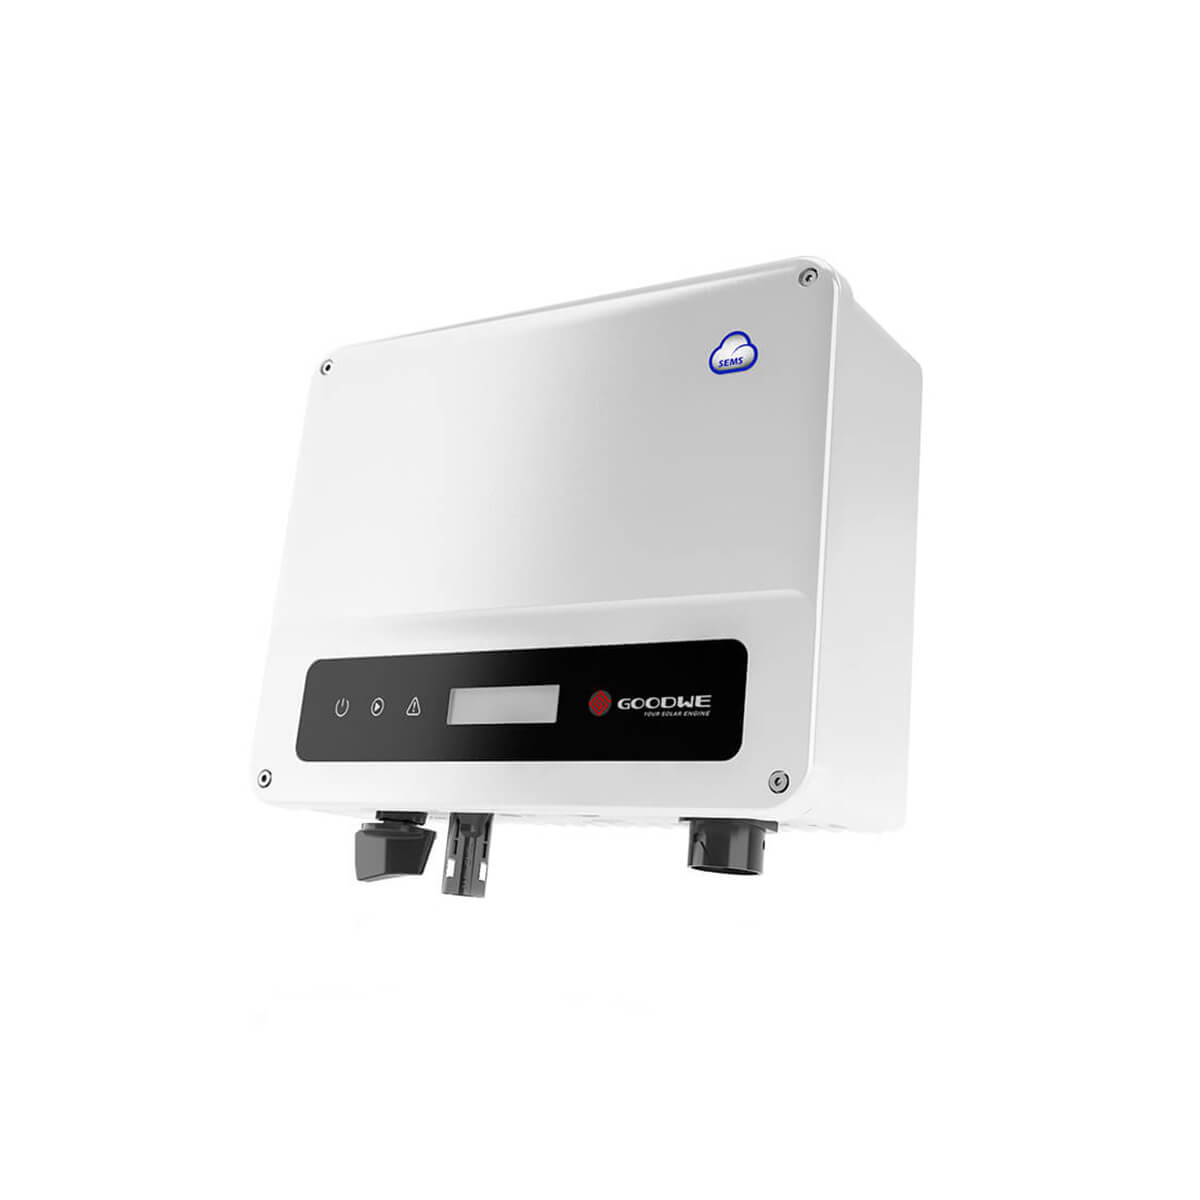 goodwe 2.5kW inverter, goodwe gw2500-xs 2.5kW inverter, goodwe gw2500-xs inverter, goodwe gw2500-xs, goodwe 2.5 kW, GOODWE 2.5 KW